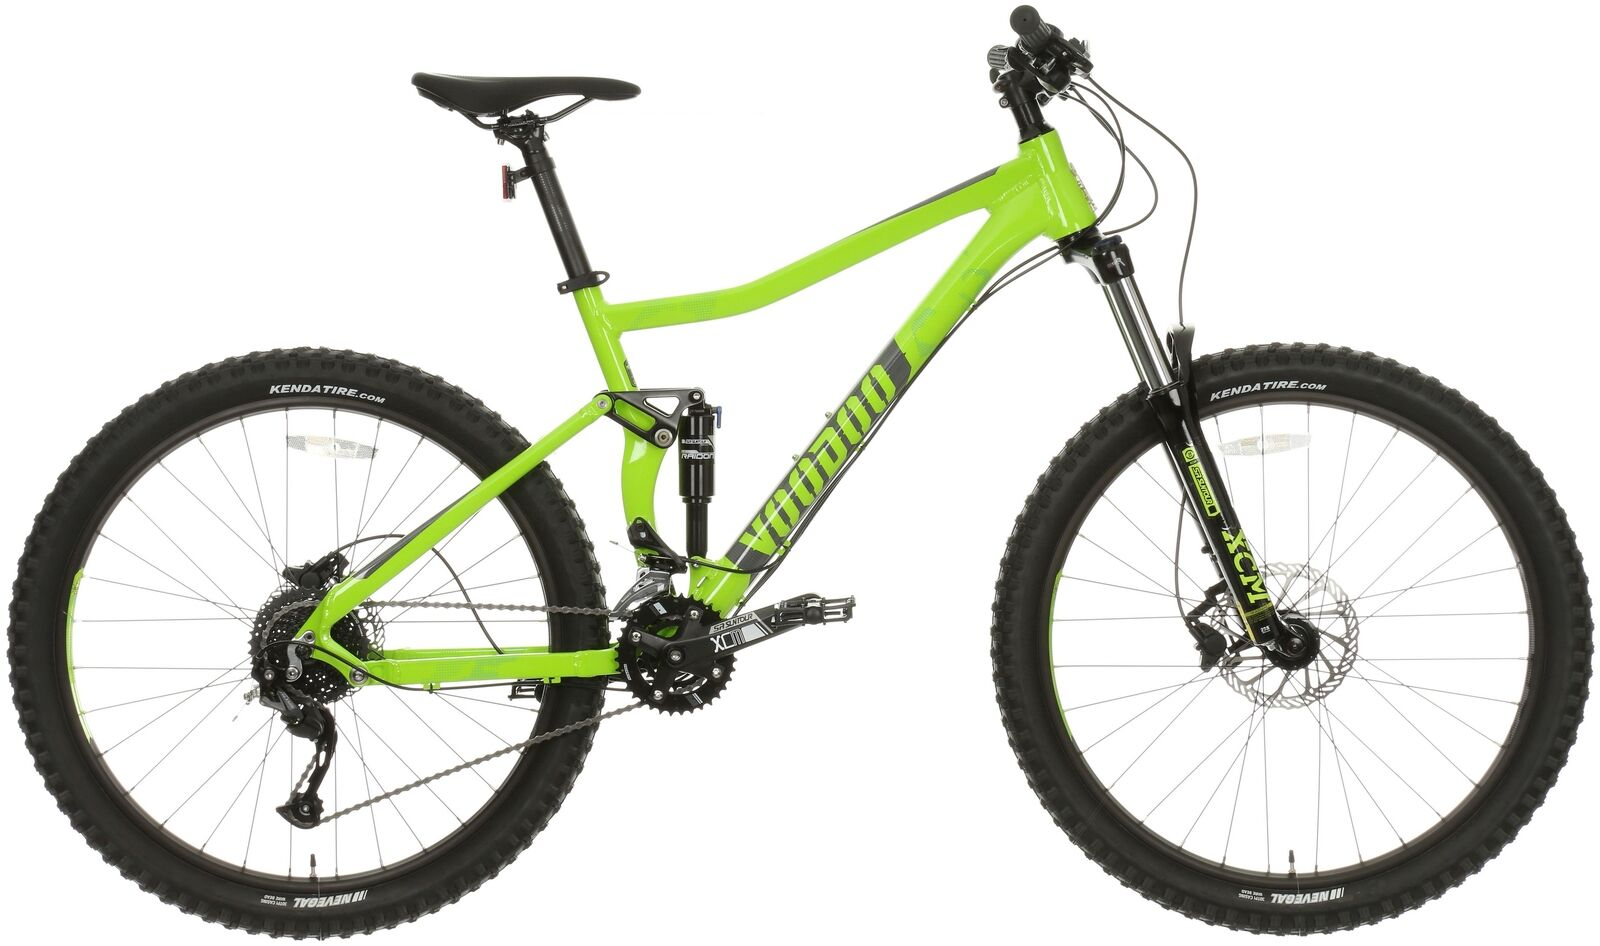 Voodoo Minustor Mountain Bike Bicycle Cycle Cycling